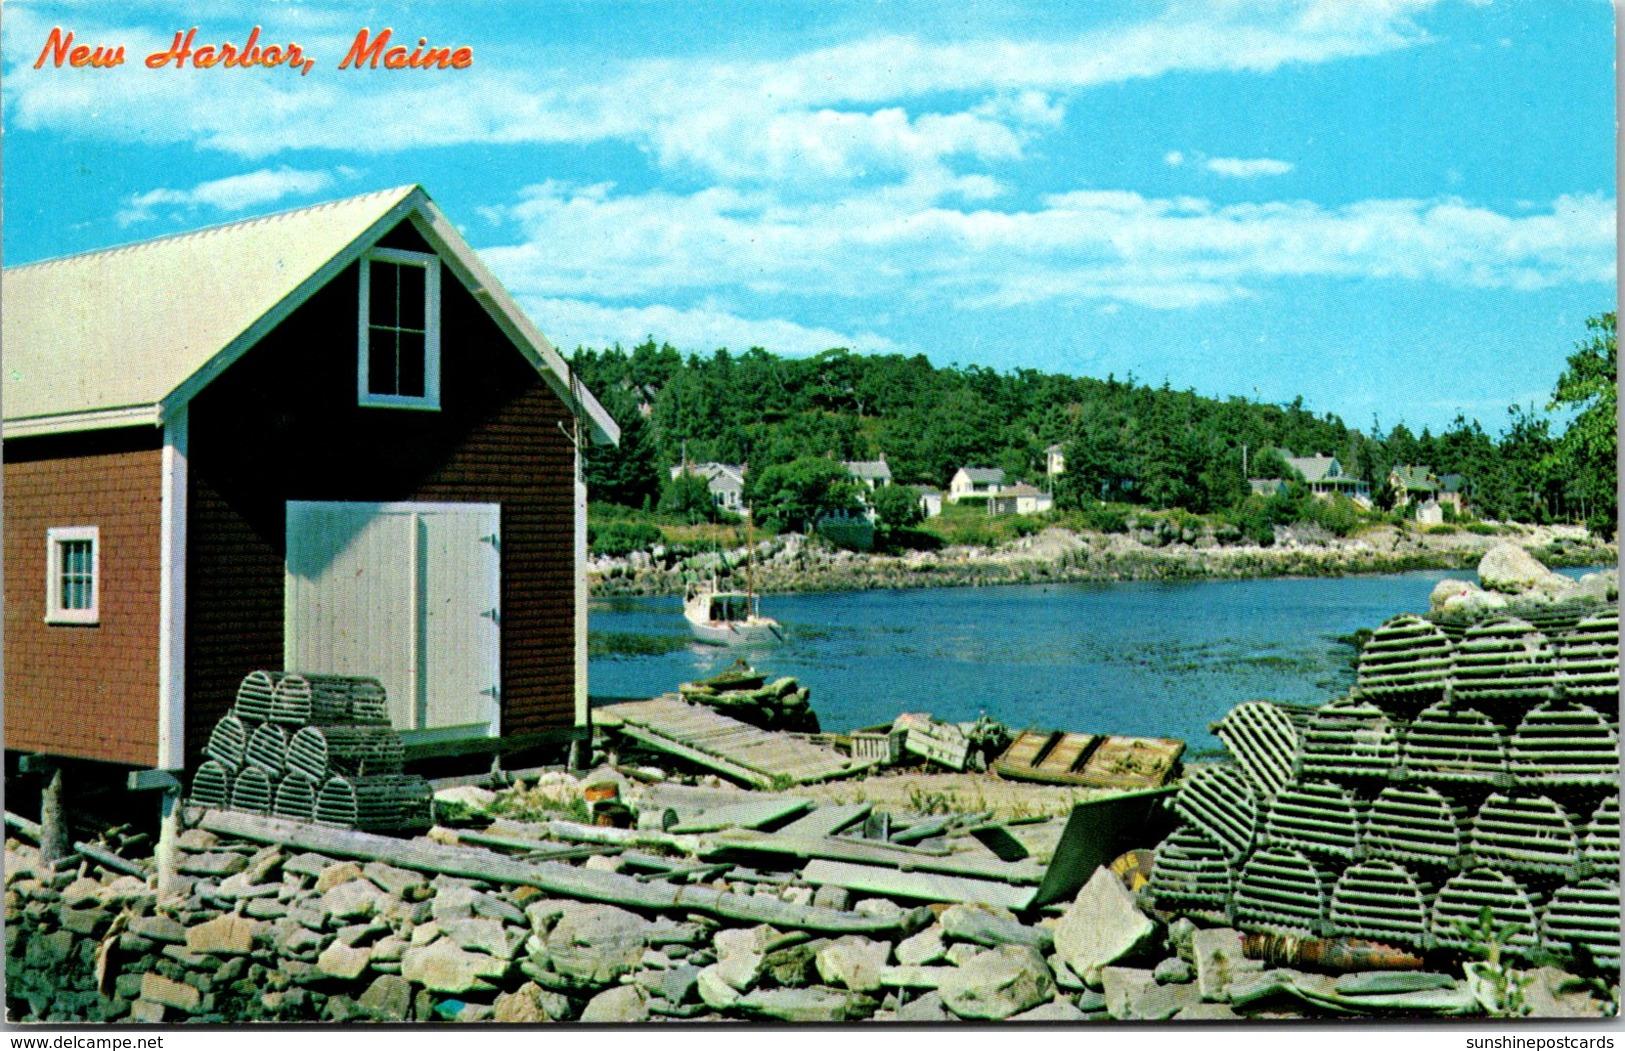 Maine New Harbor View Of Quaint Back Cove